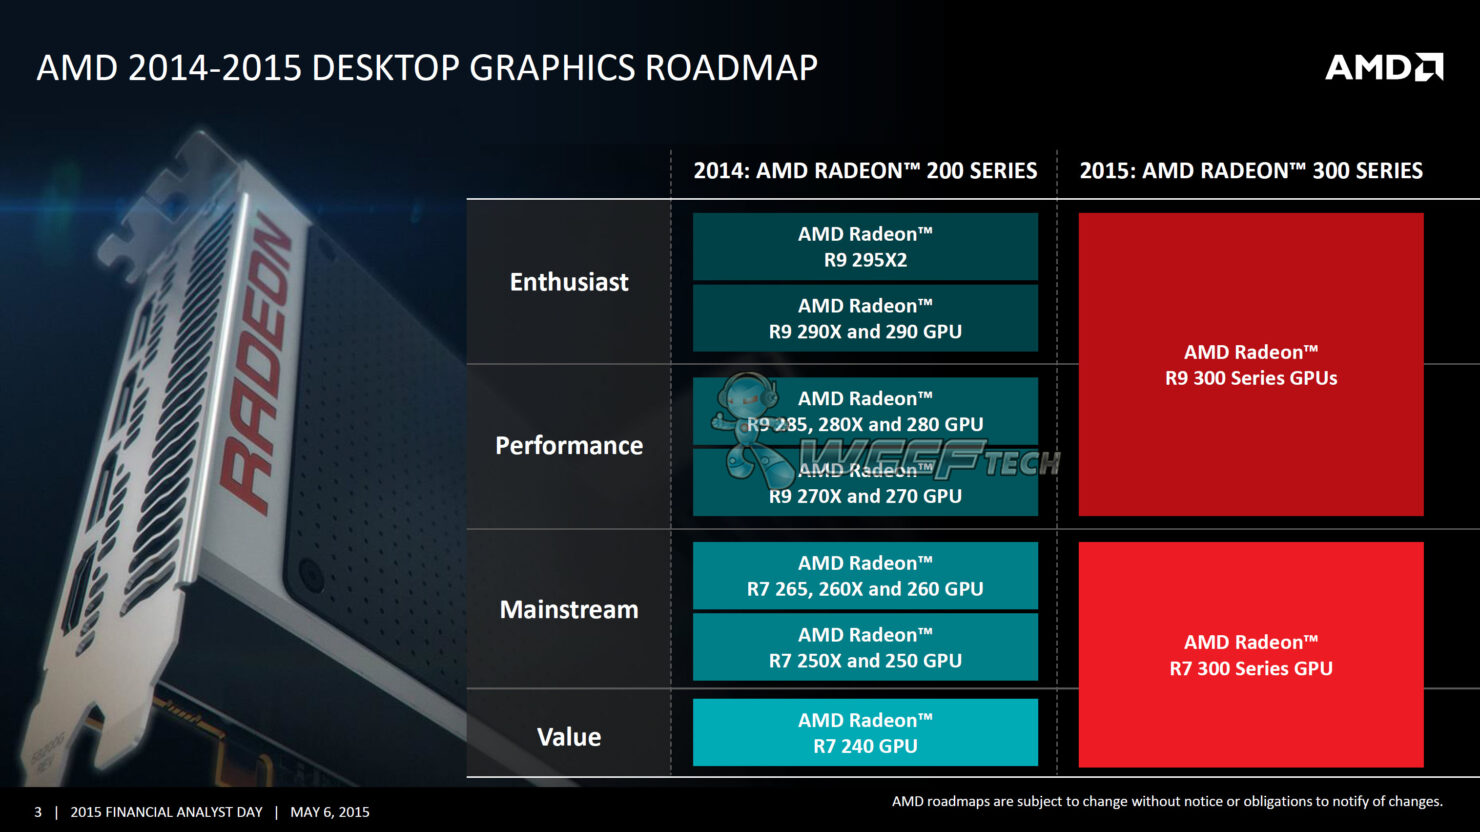 amd-radeon-graphics-roadmap-2014-2015-2